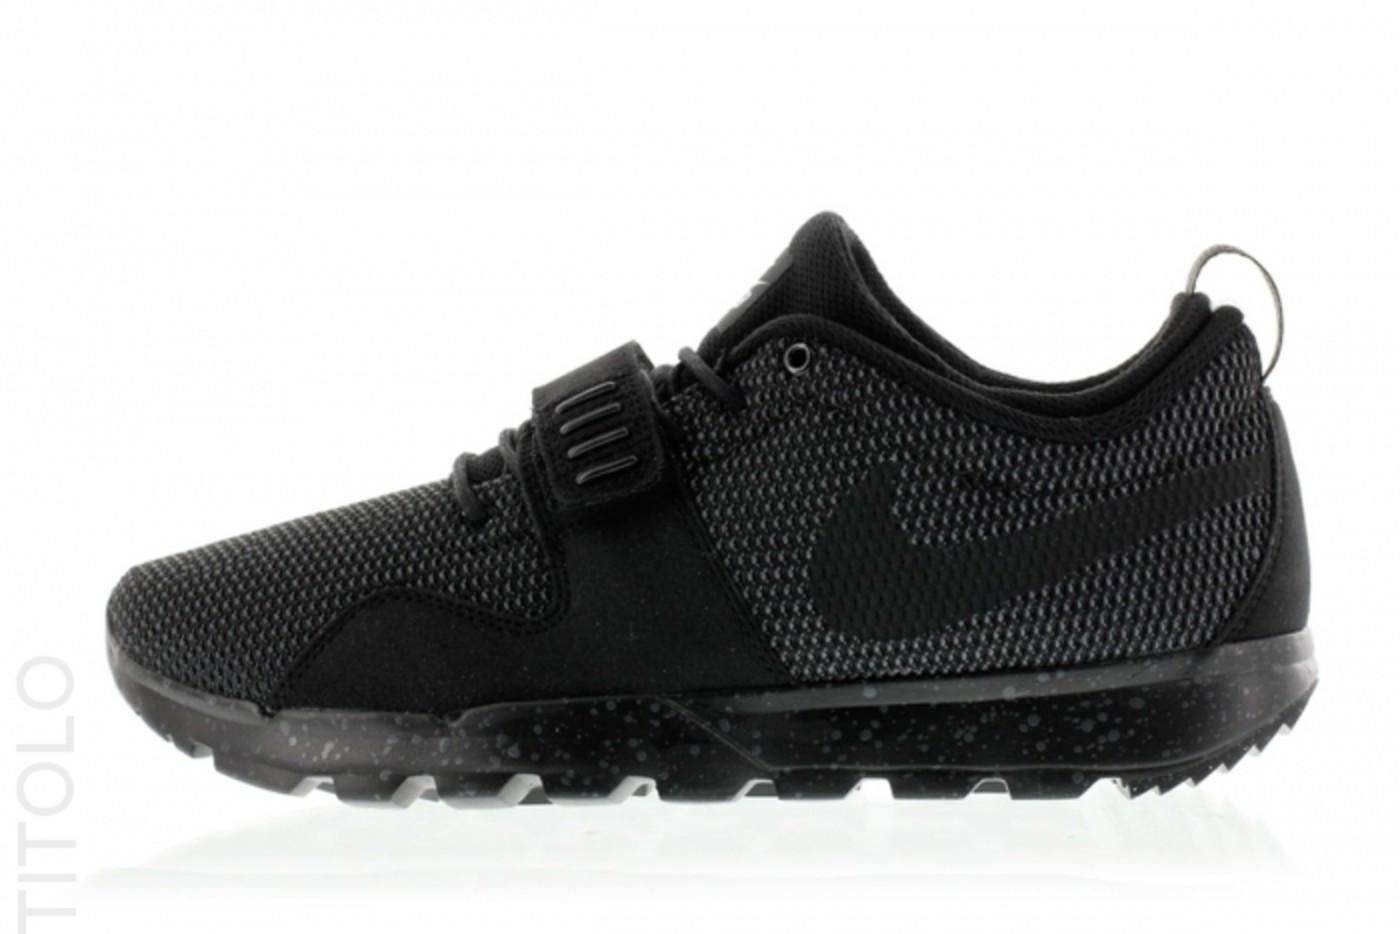 Day: Nike SB Trainerendor \